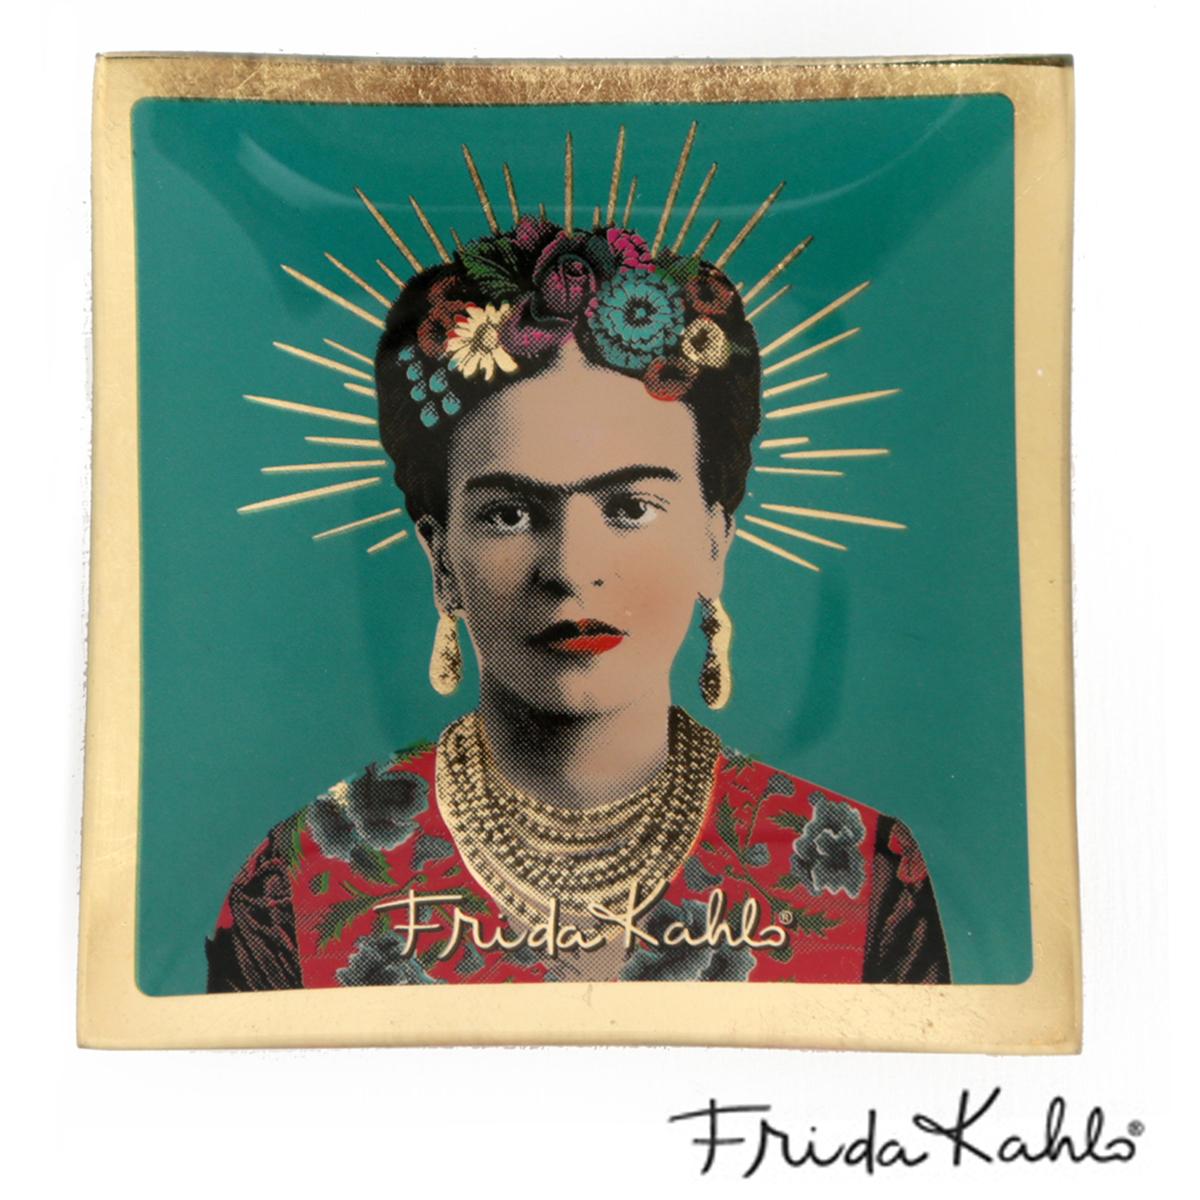 Coupelle vide poches verre \'Frida Kahlo\' turquoise - 10x10 cm - [A0033]